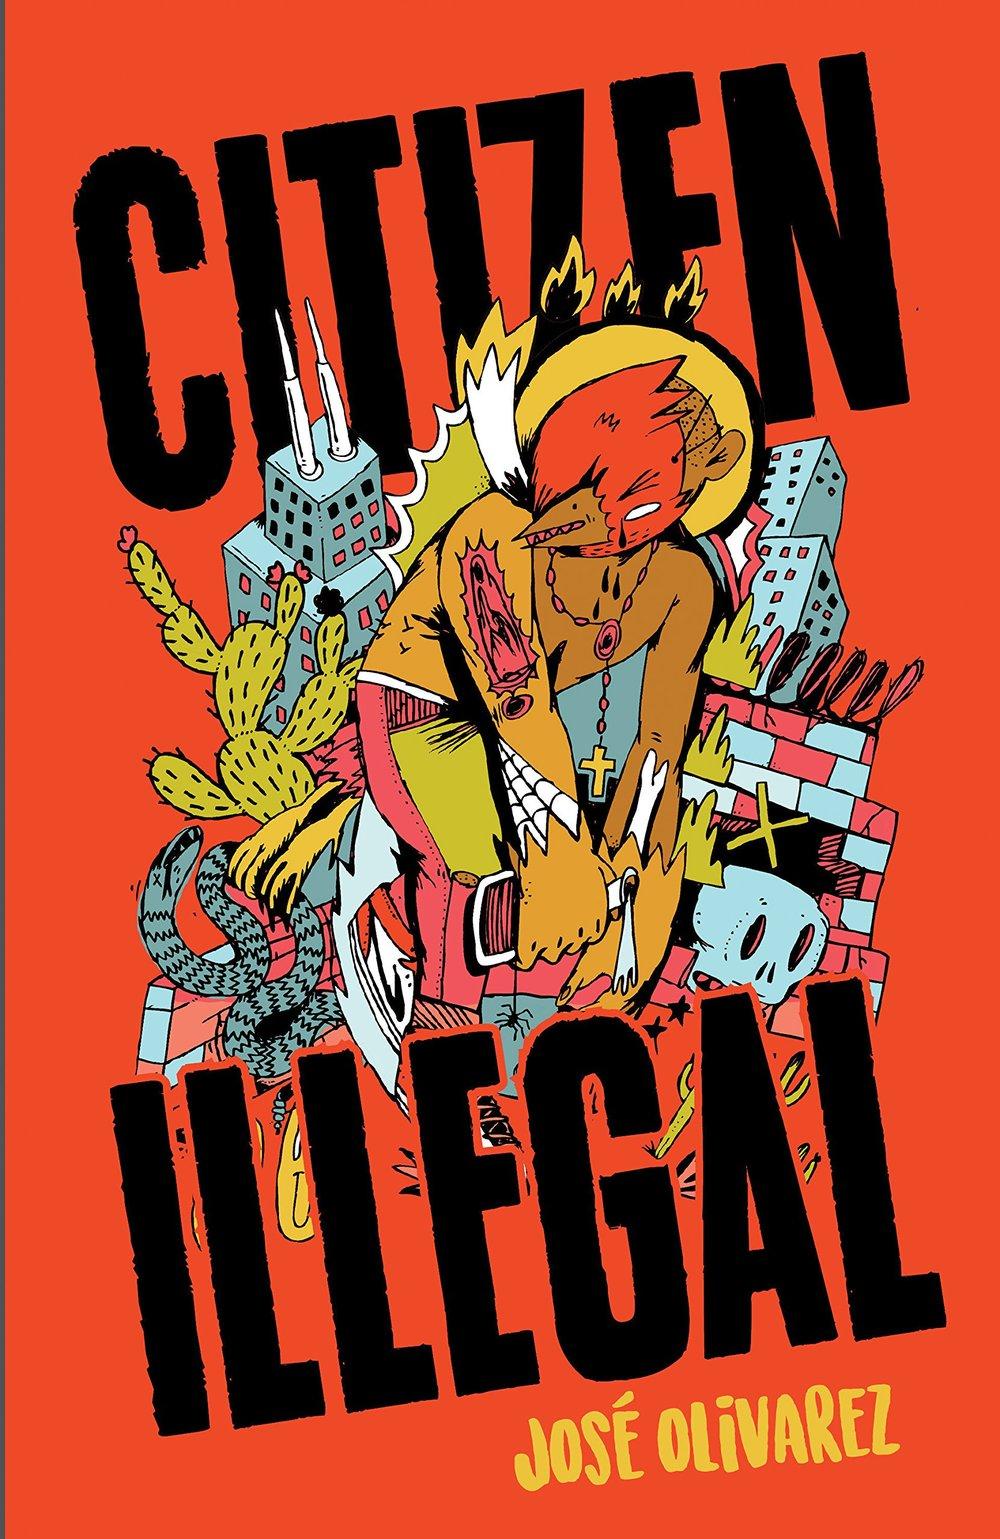 Citizen Illegal_Santa Ana_Makara.jpg